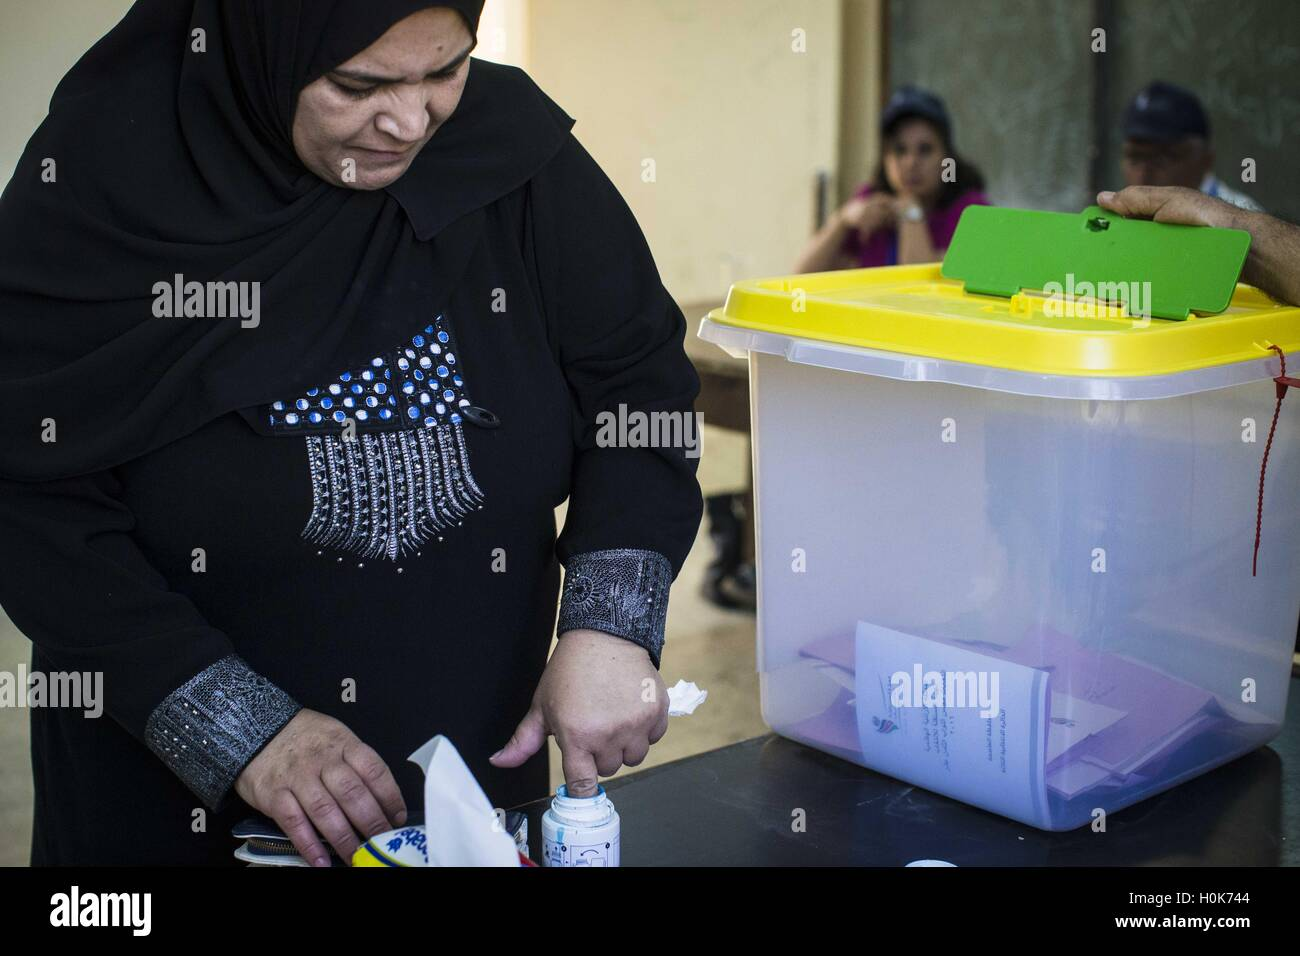 e95071b49bd Amman, Amman, Jordan. 20th Sep, 2016. A Jordanian woman casts her